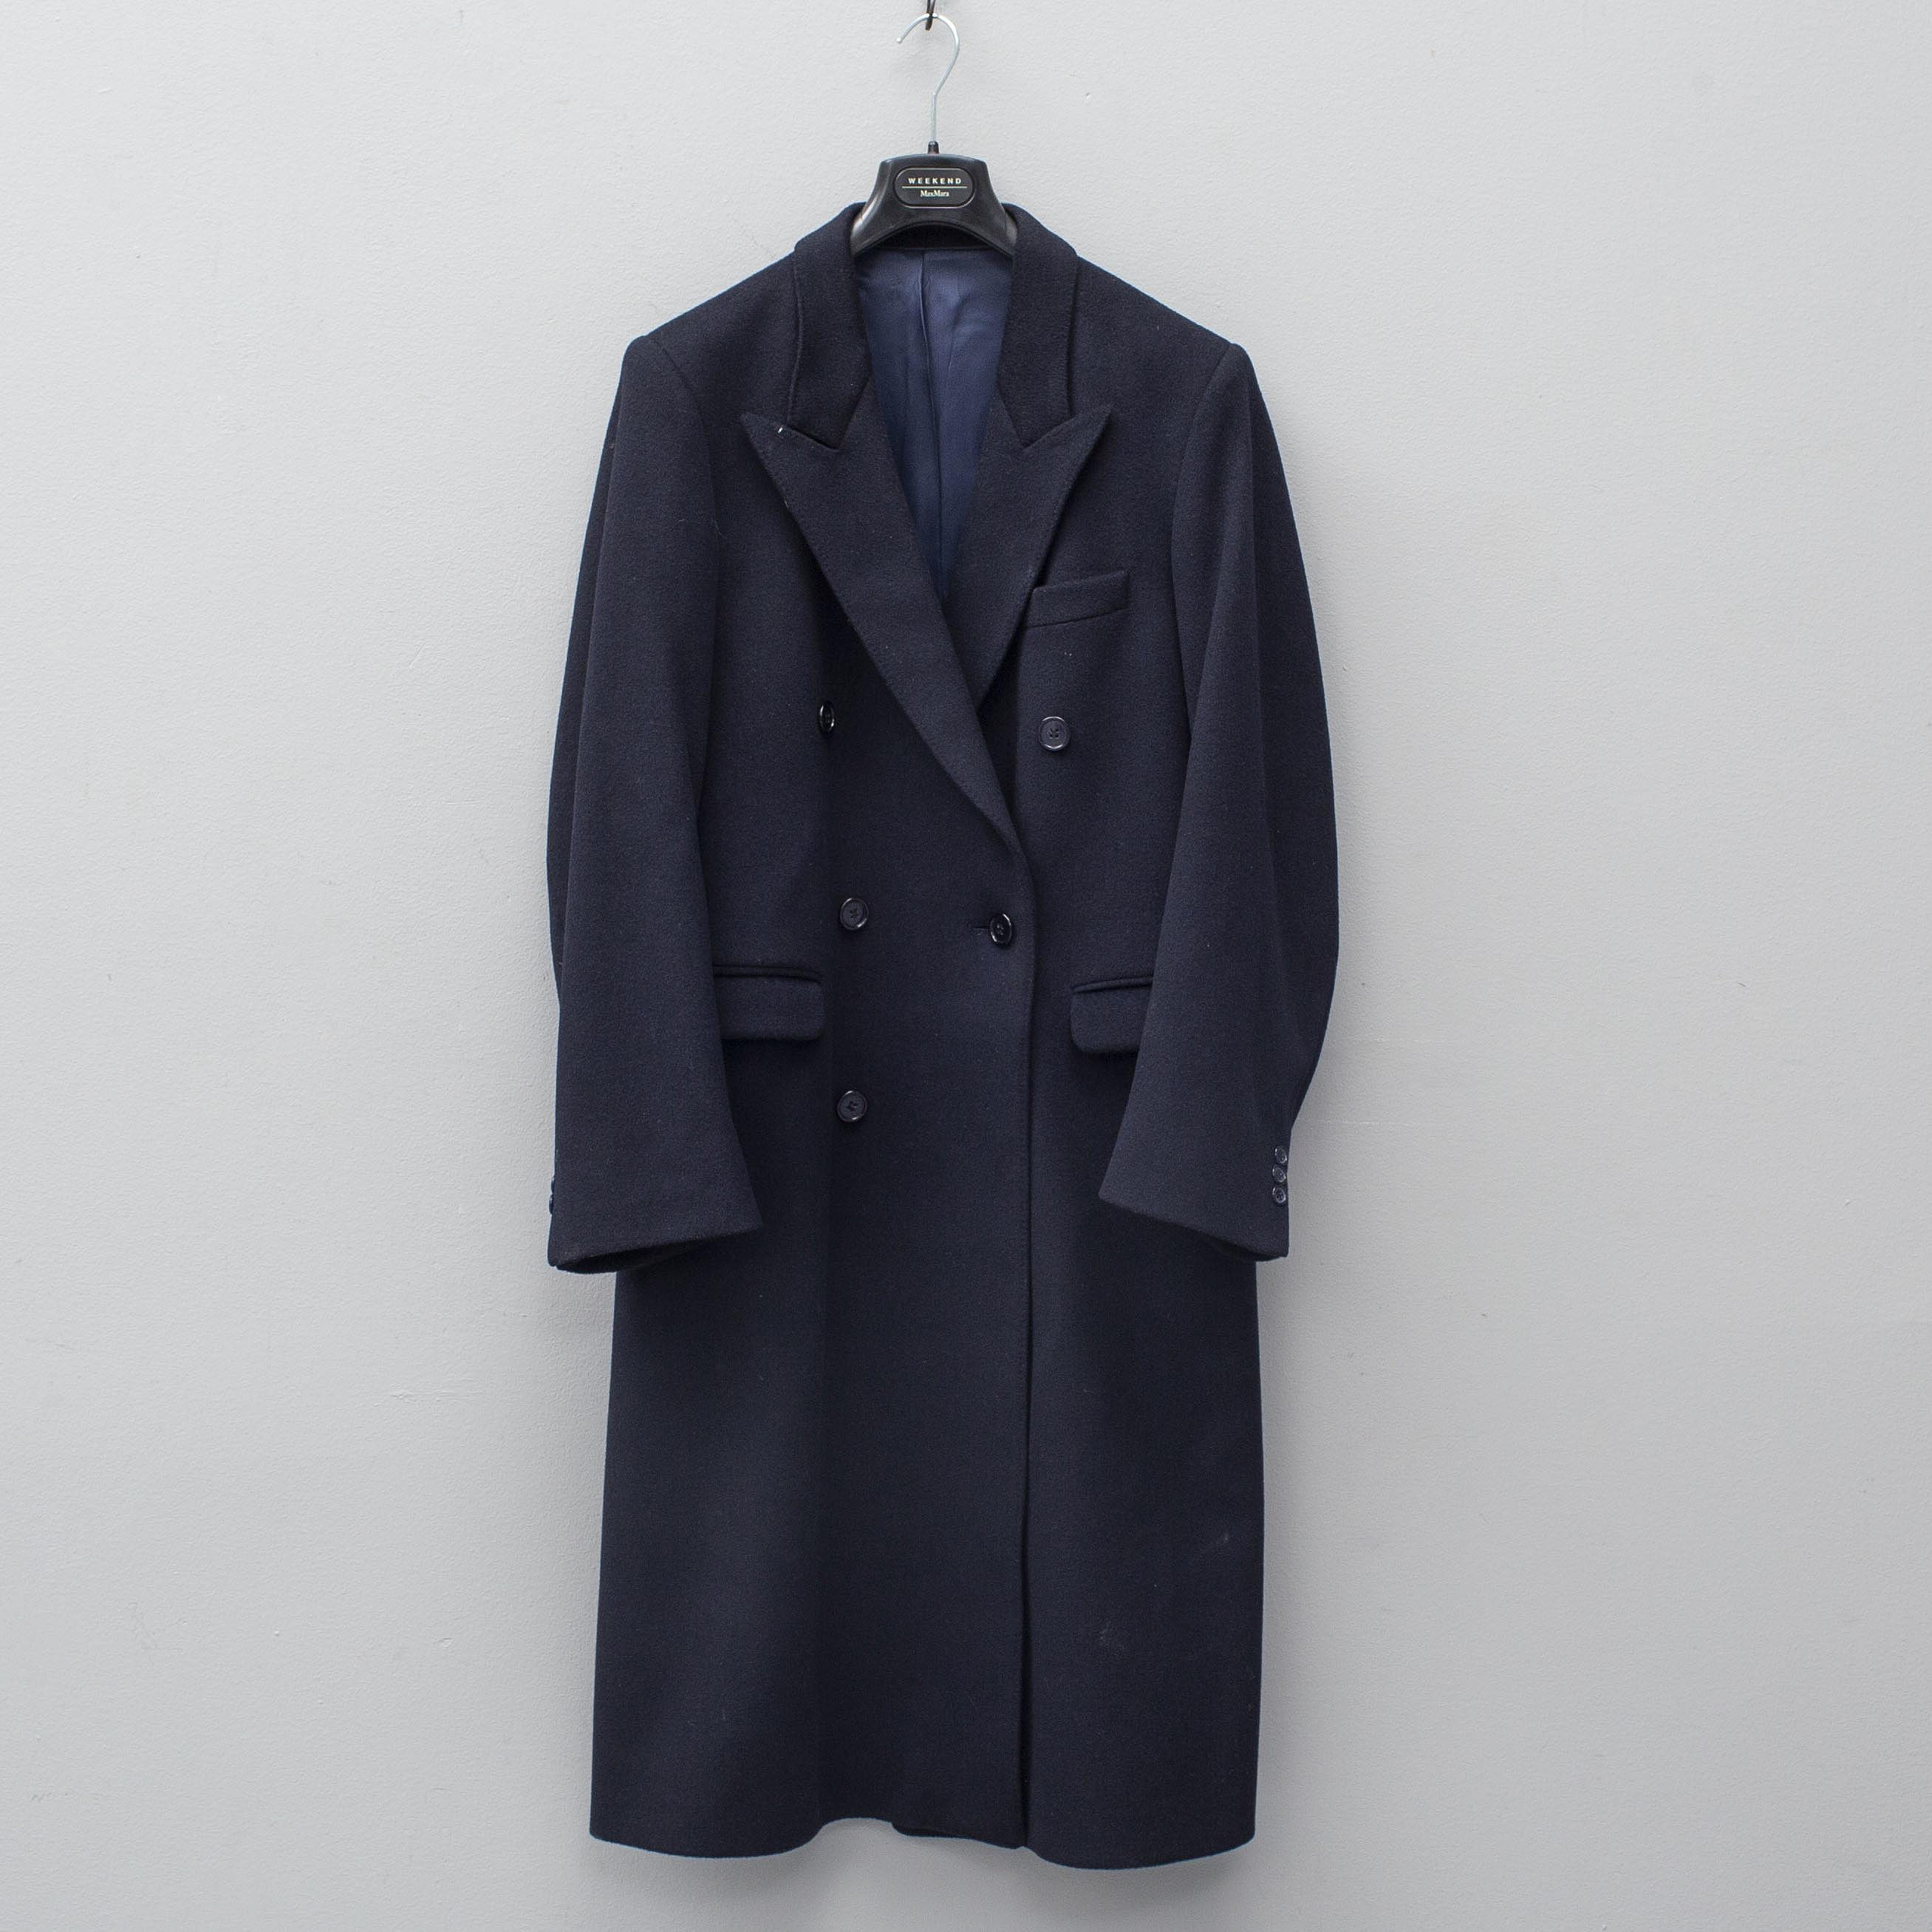 2dcbb103c62 YVES SAINT LAURENT, a navy wool coat. - Bukowskis